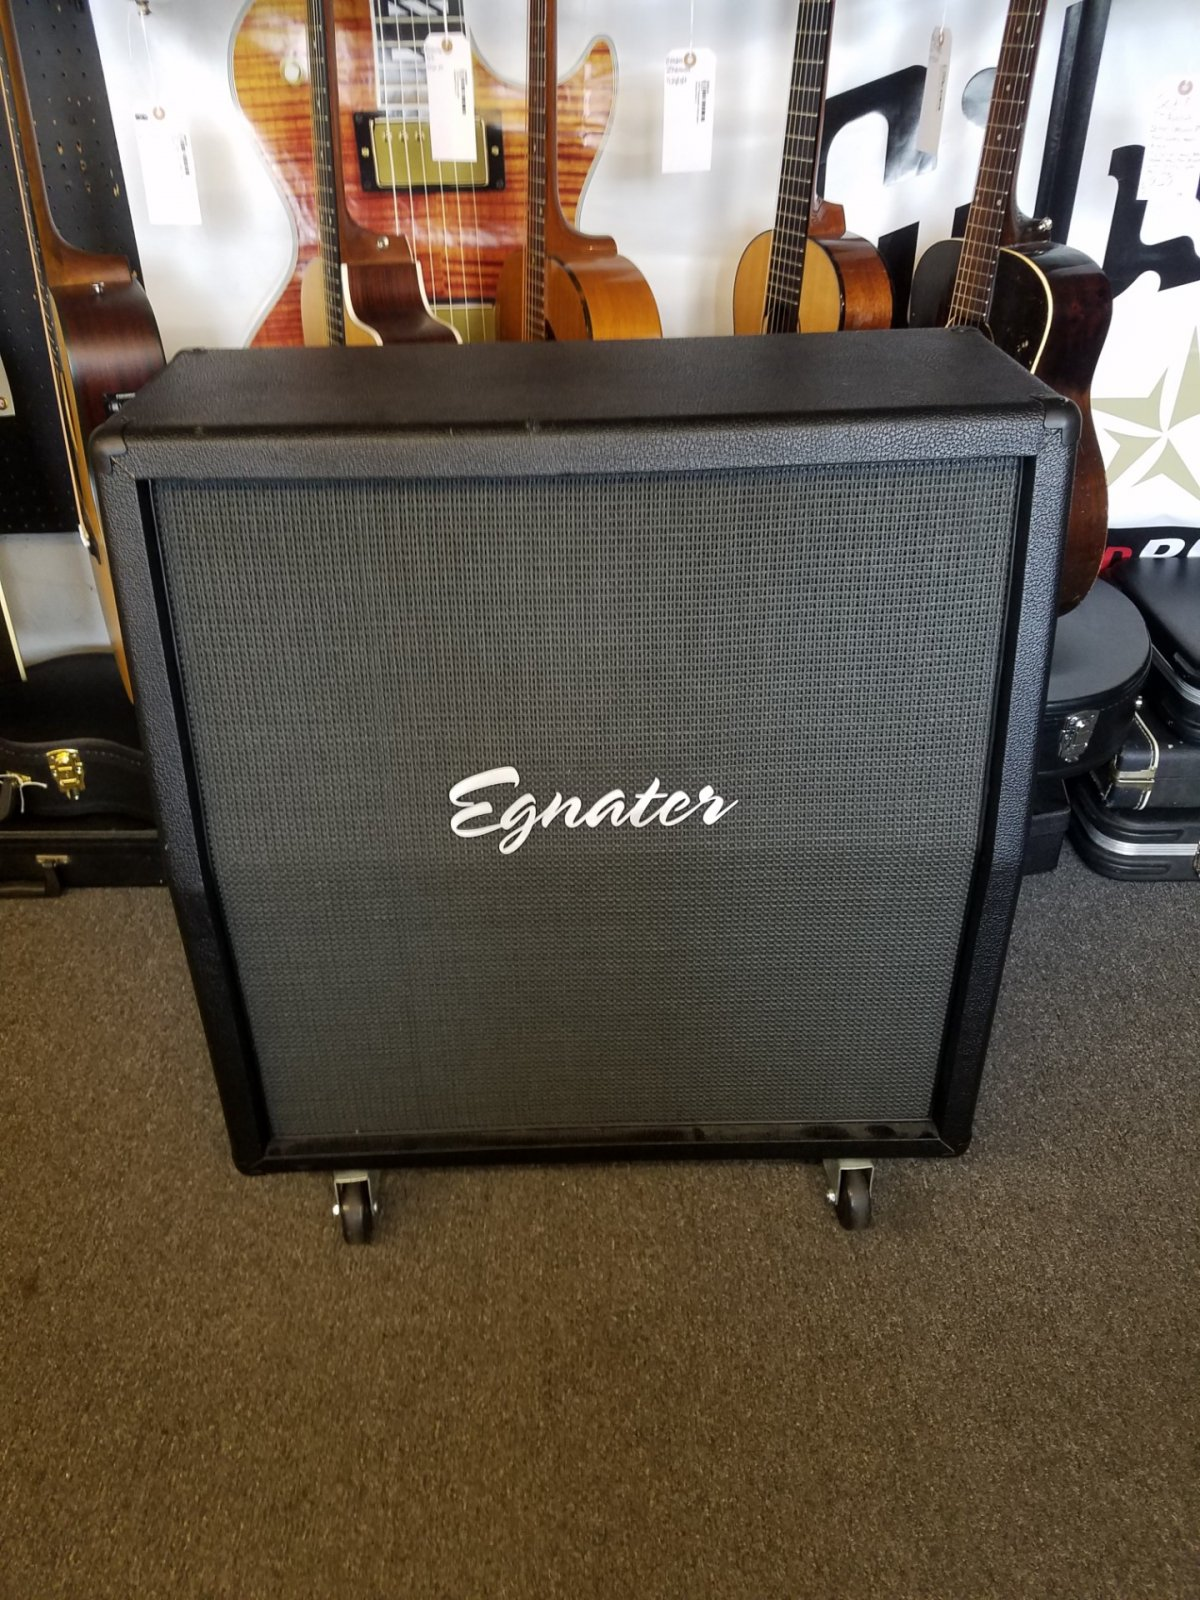 USED Egnater VN-412